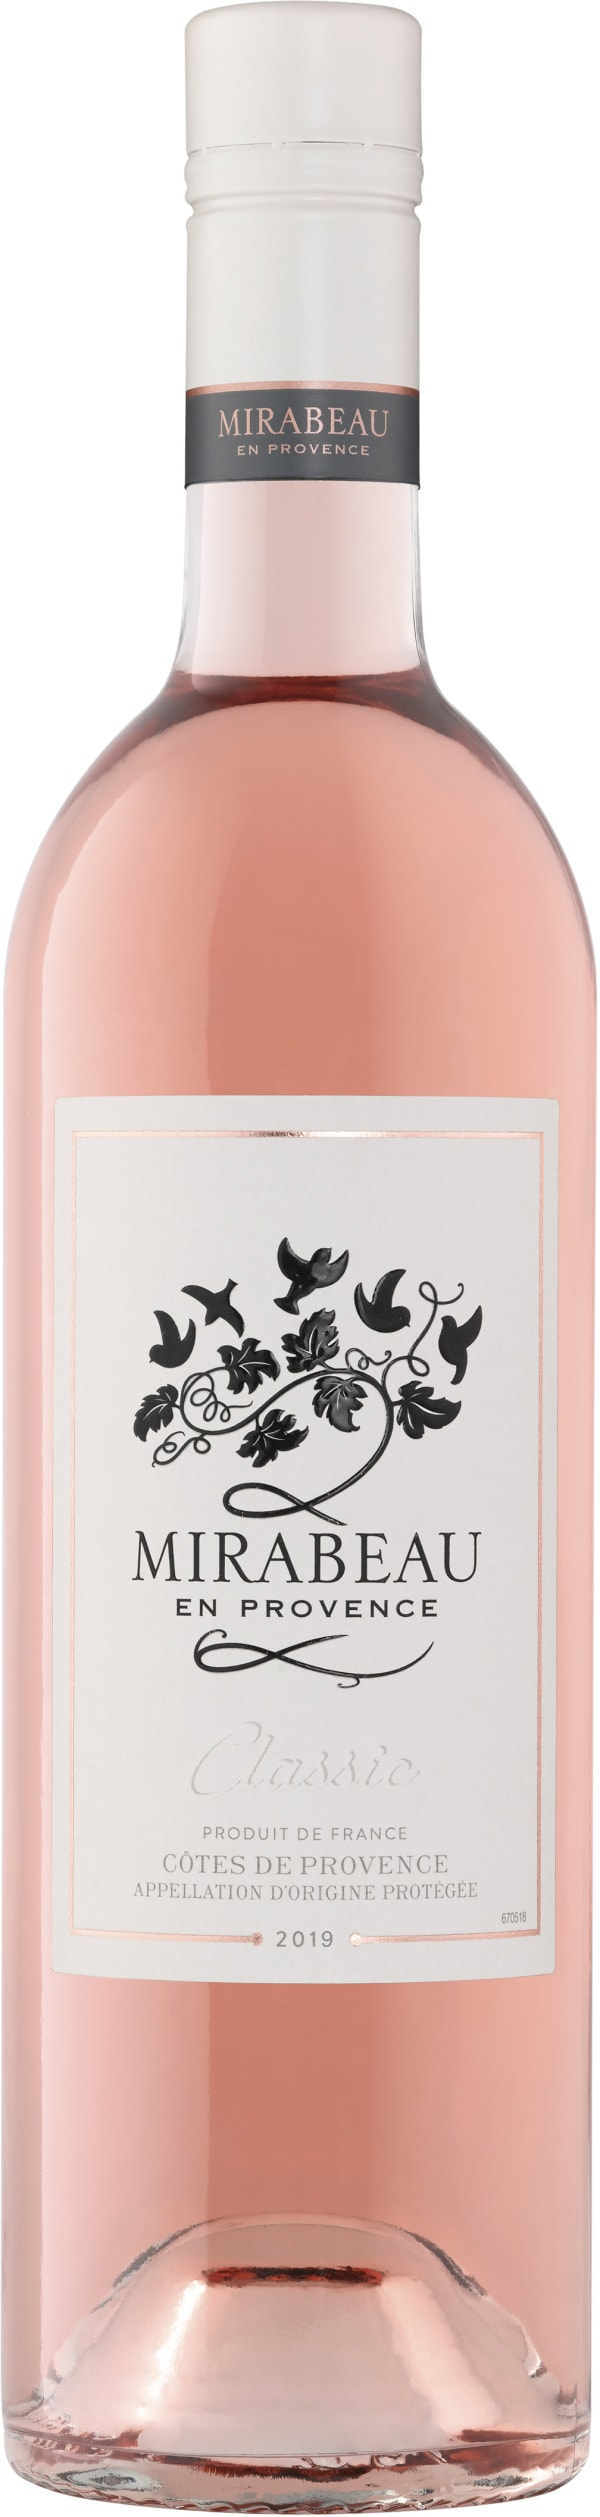 Mirabeau en Provence Rose 2018